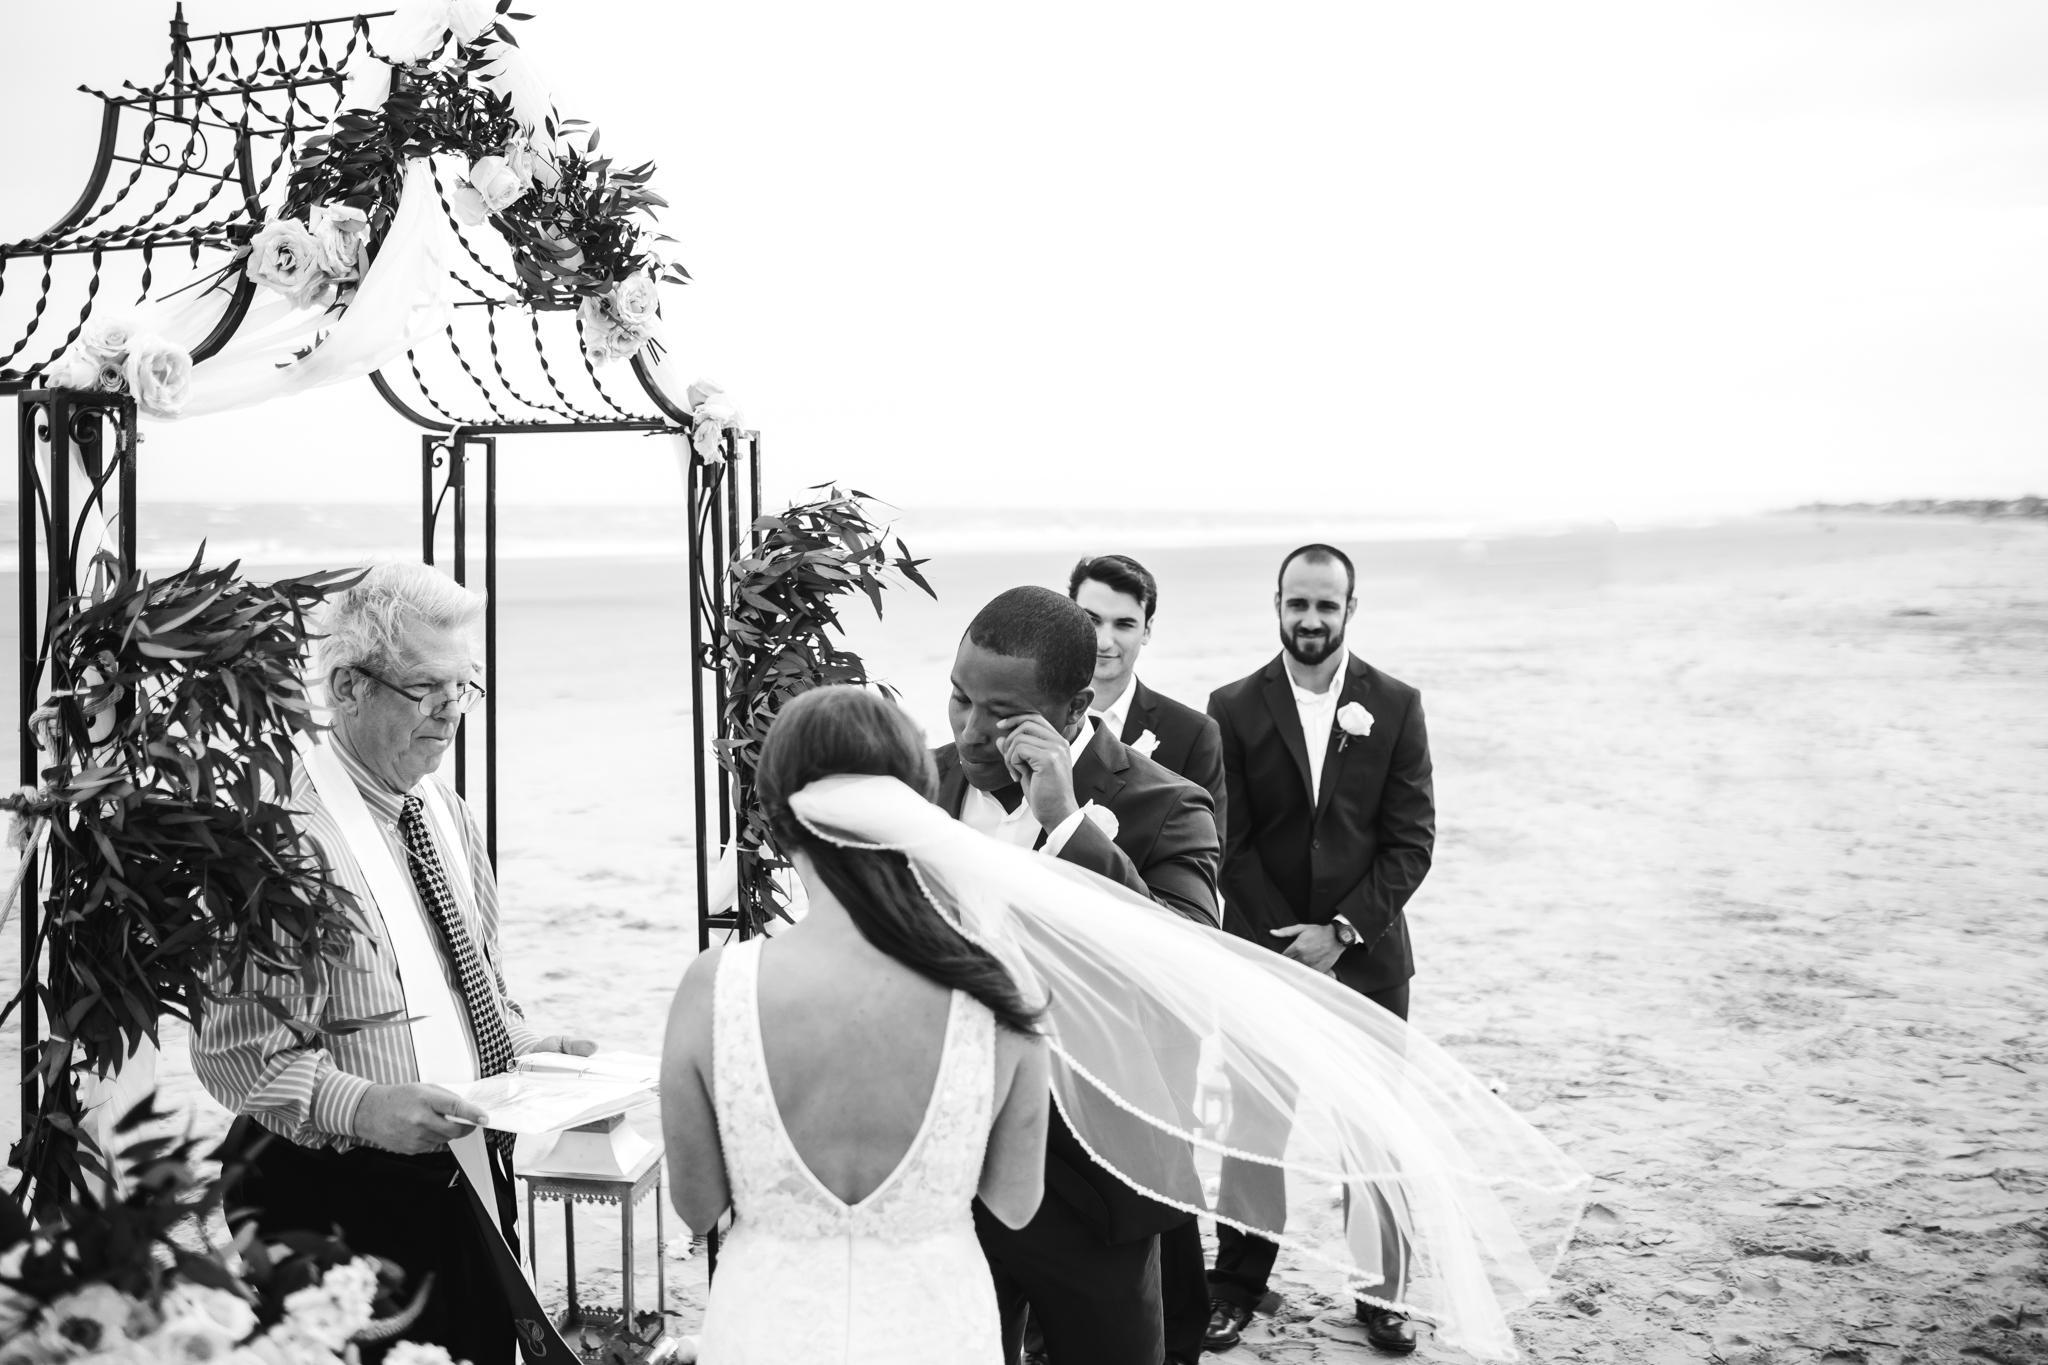 thewarmtharoundyou-fripps-island-wedding-south-carolina-beach-wedding (5 of 21).jpg